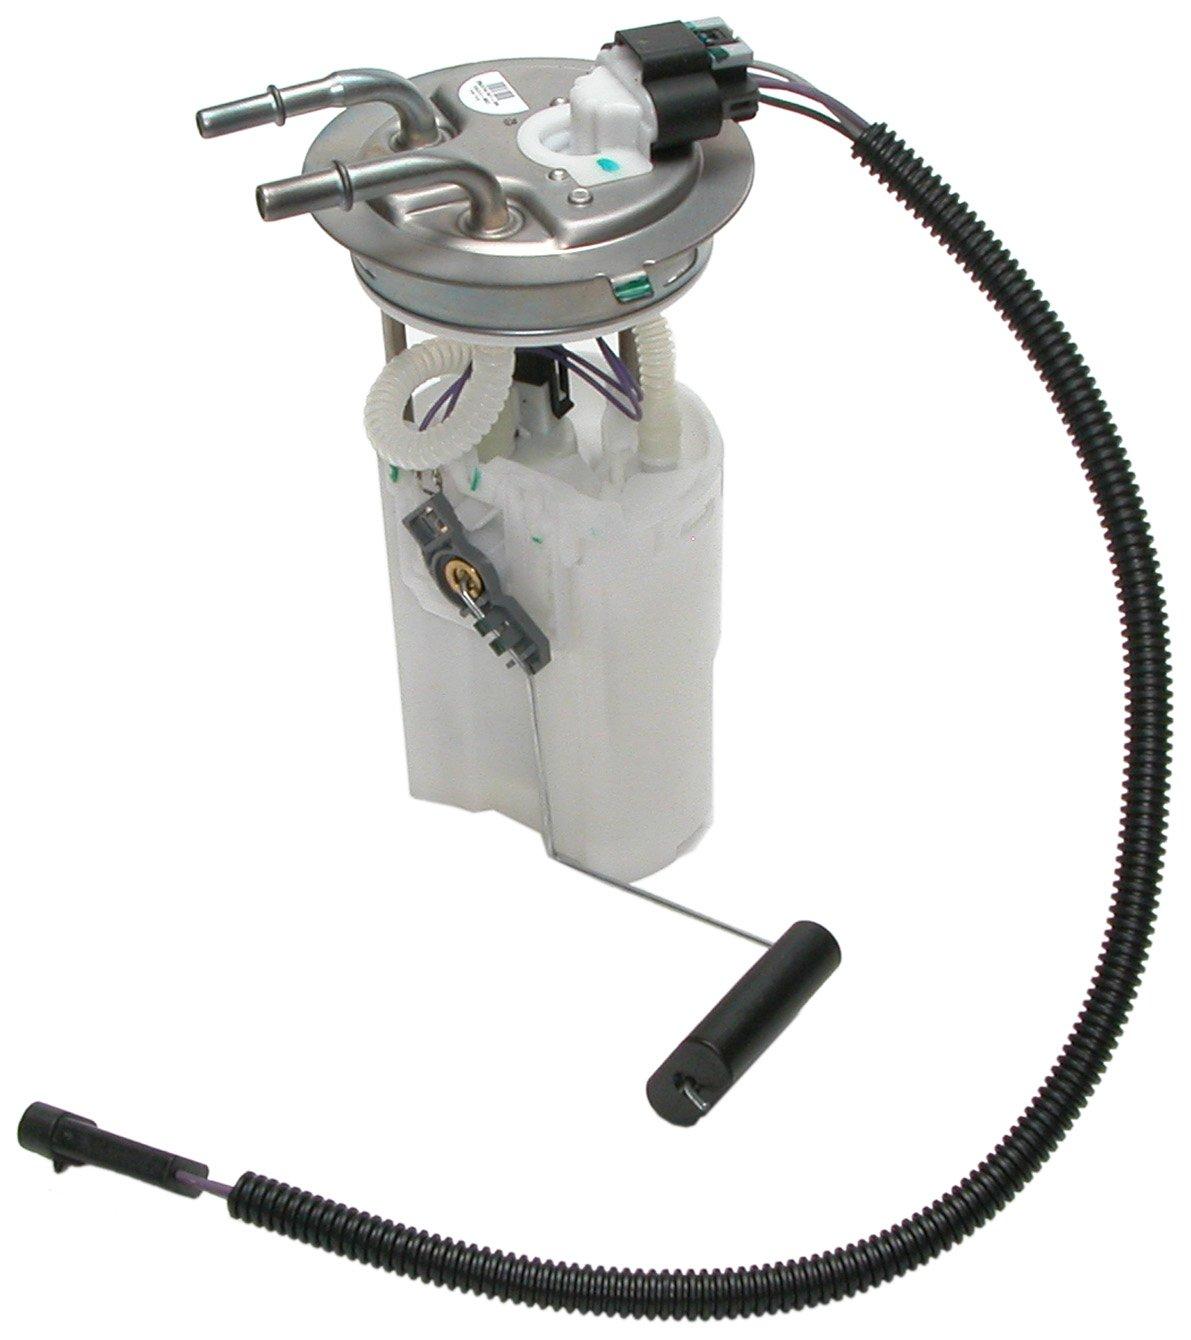 Delphi Fg0387 Fuel Pump Module Automotive 2002 Trailblazer Filter